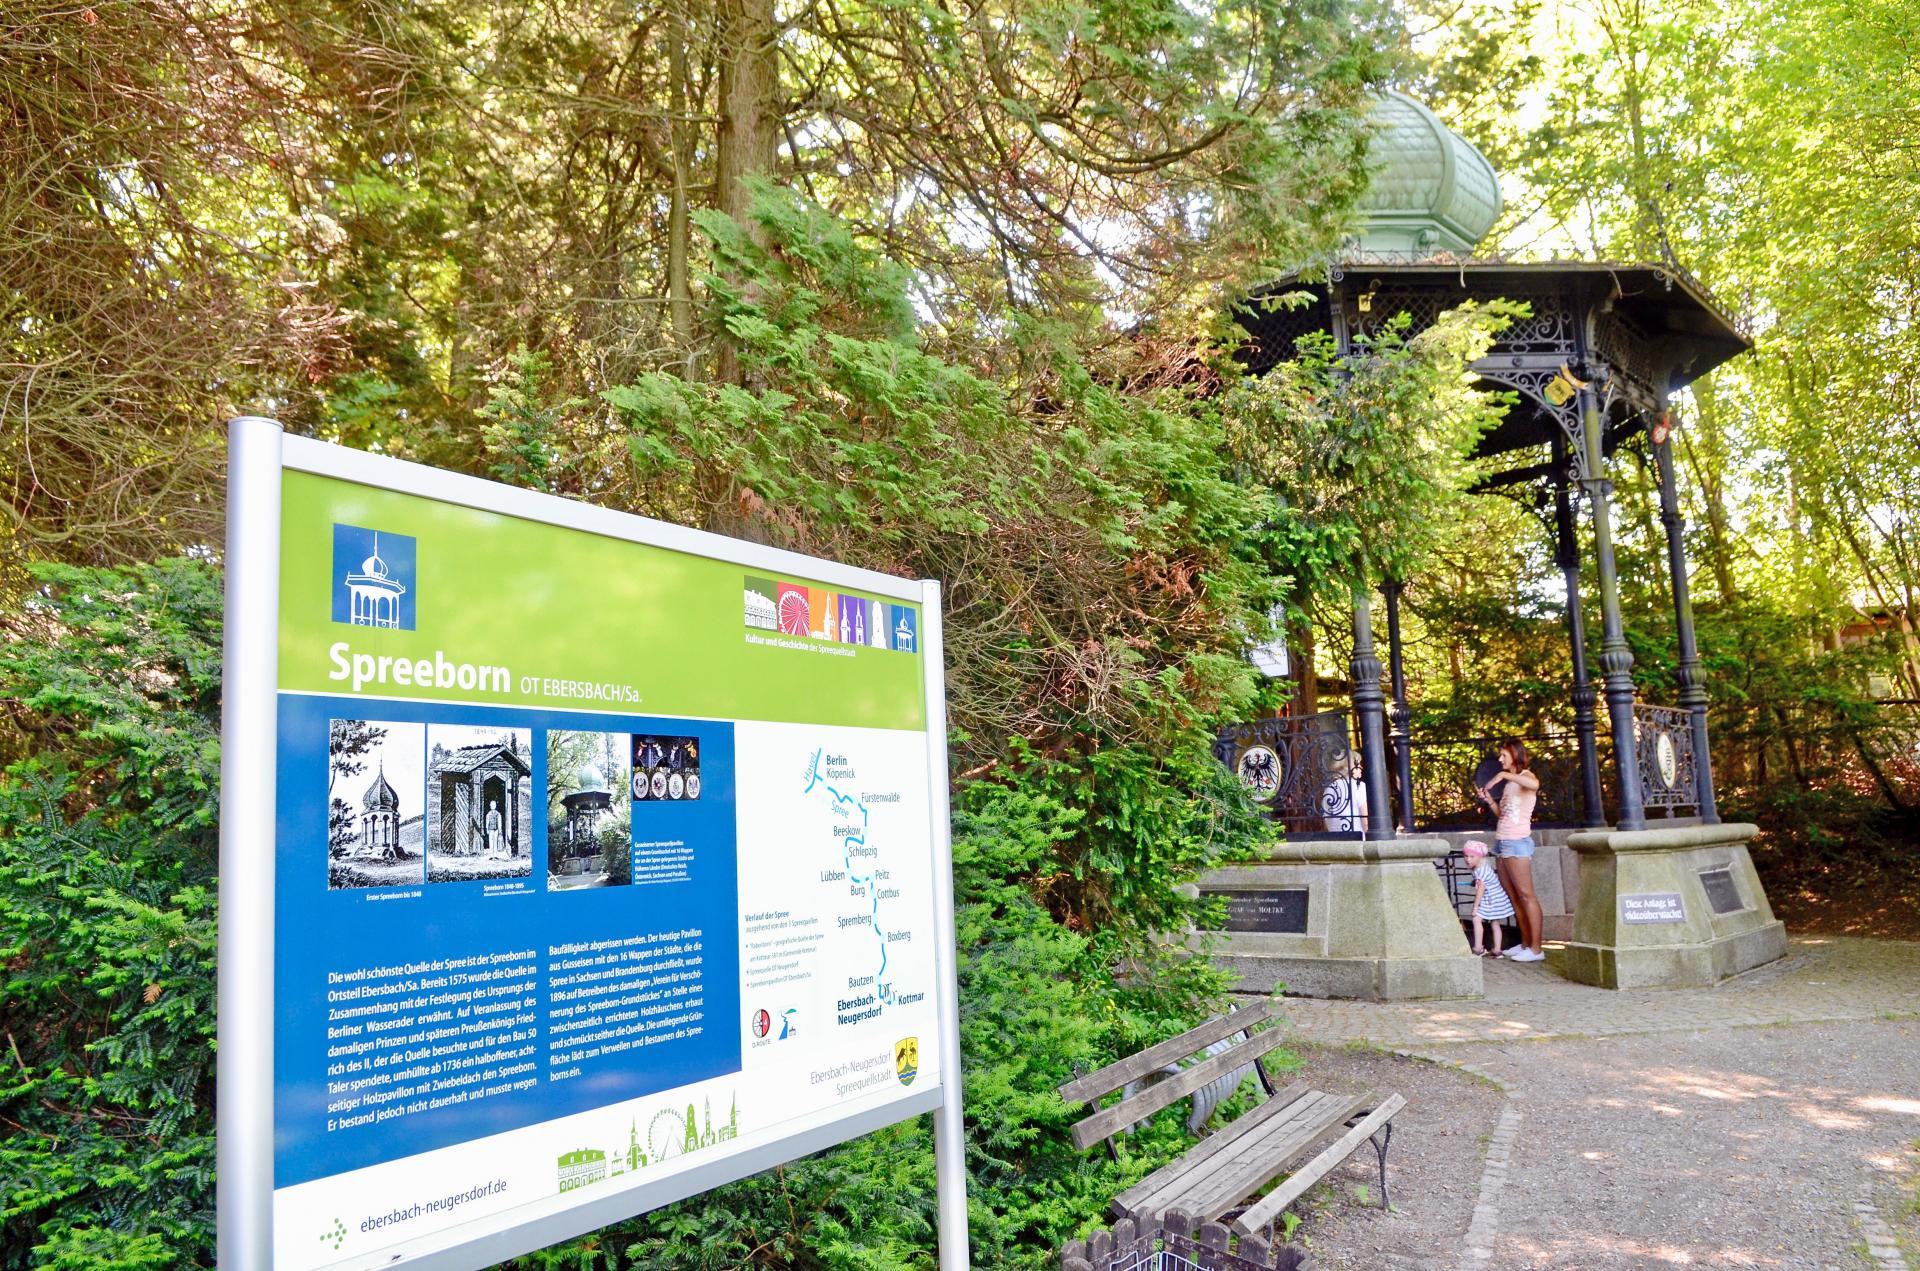 Spreeborn Ebersbach-Neugersdorf